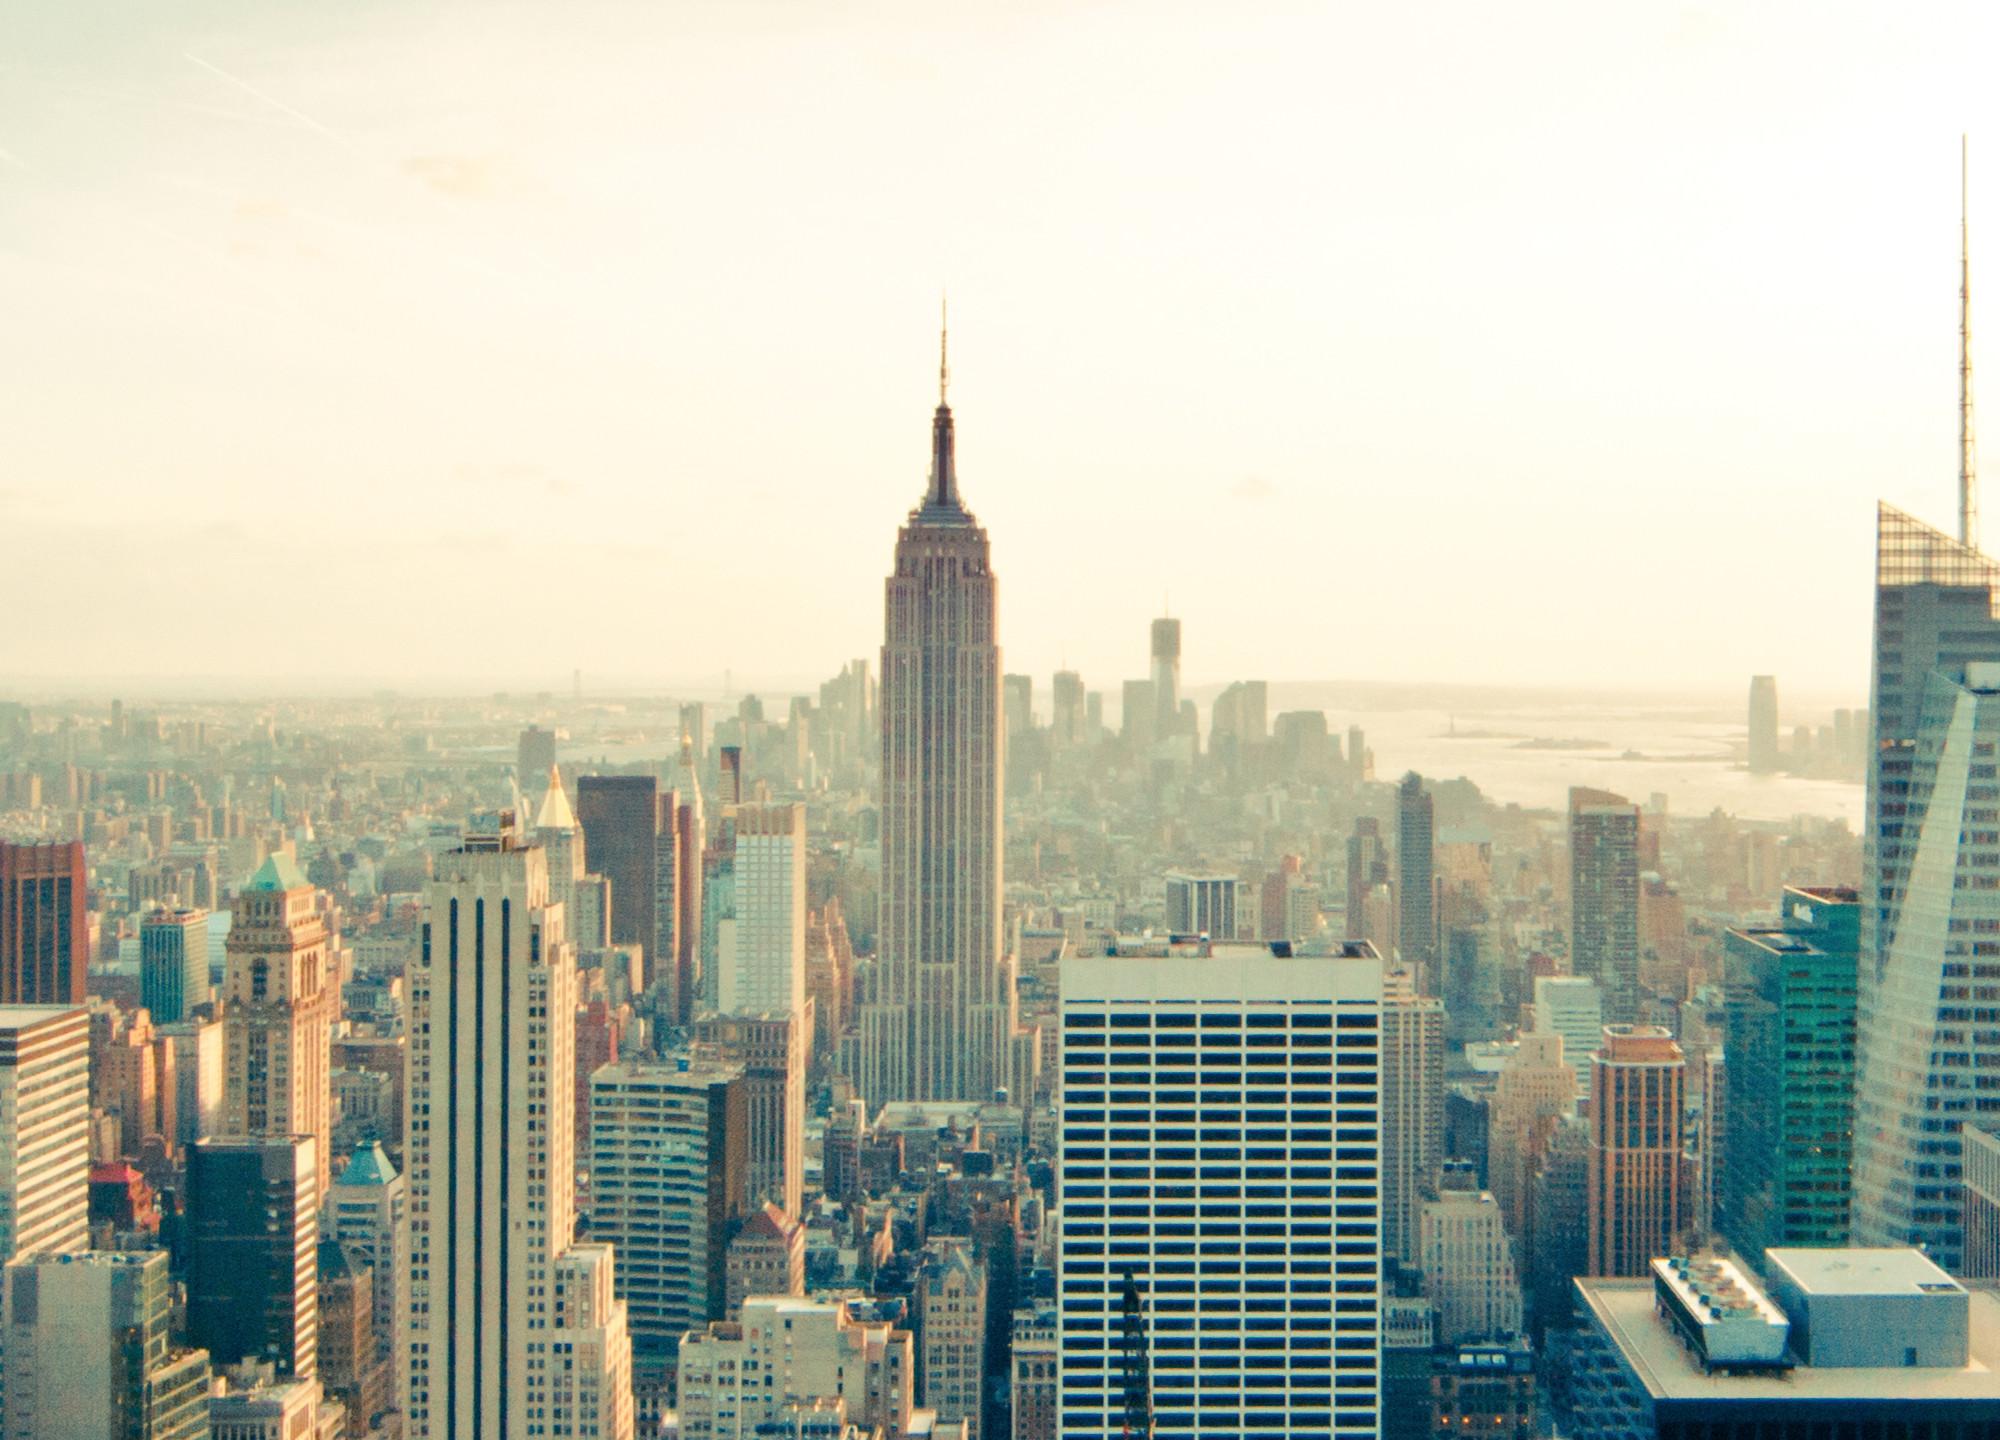 New York City Skyline 219 Wallpaper Ultrawide Monitor 21